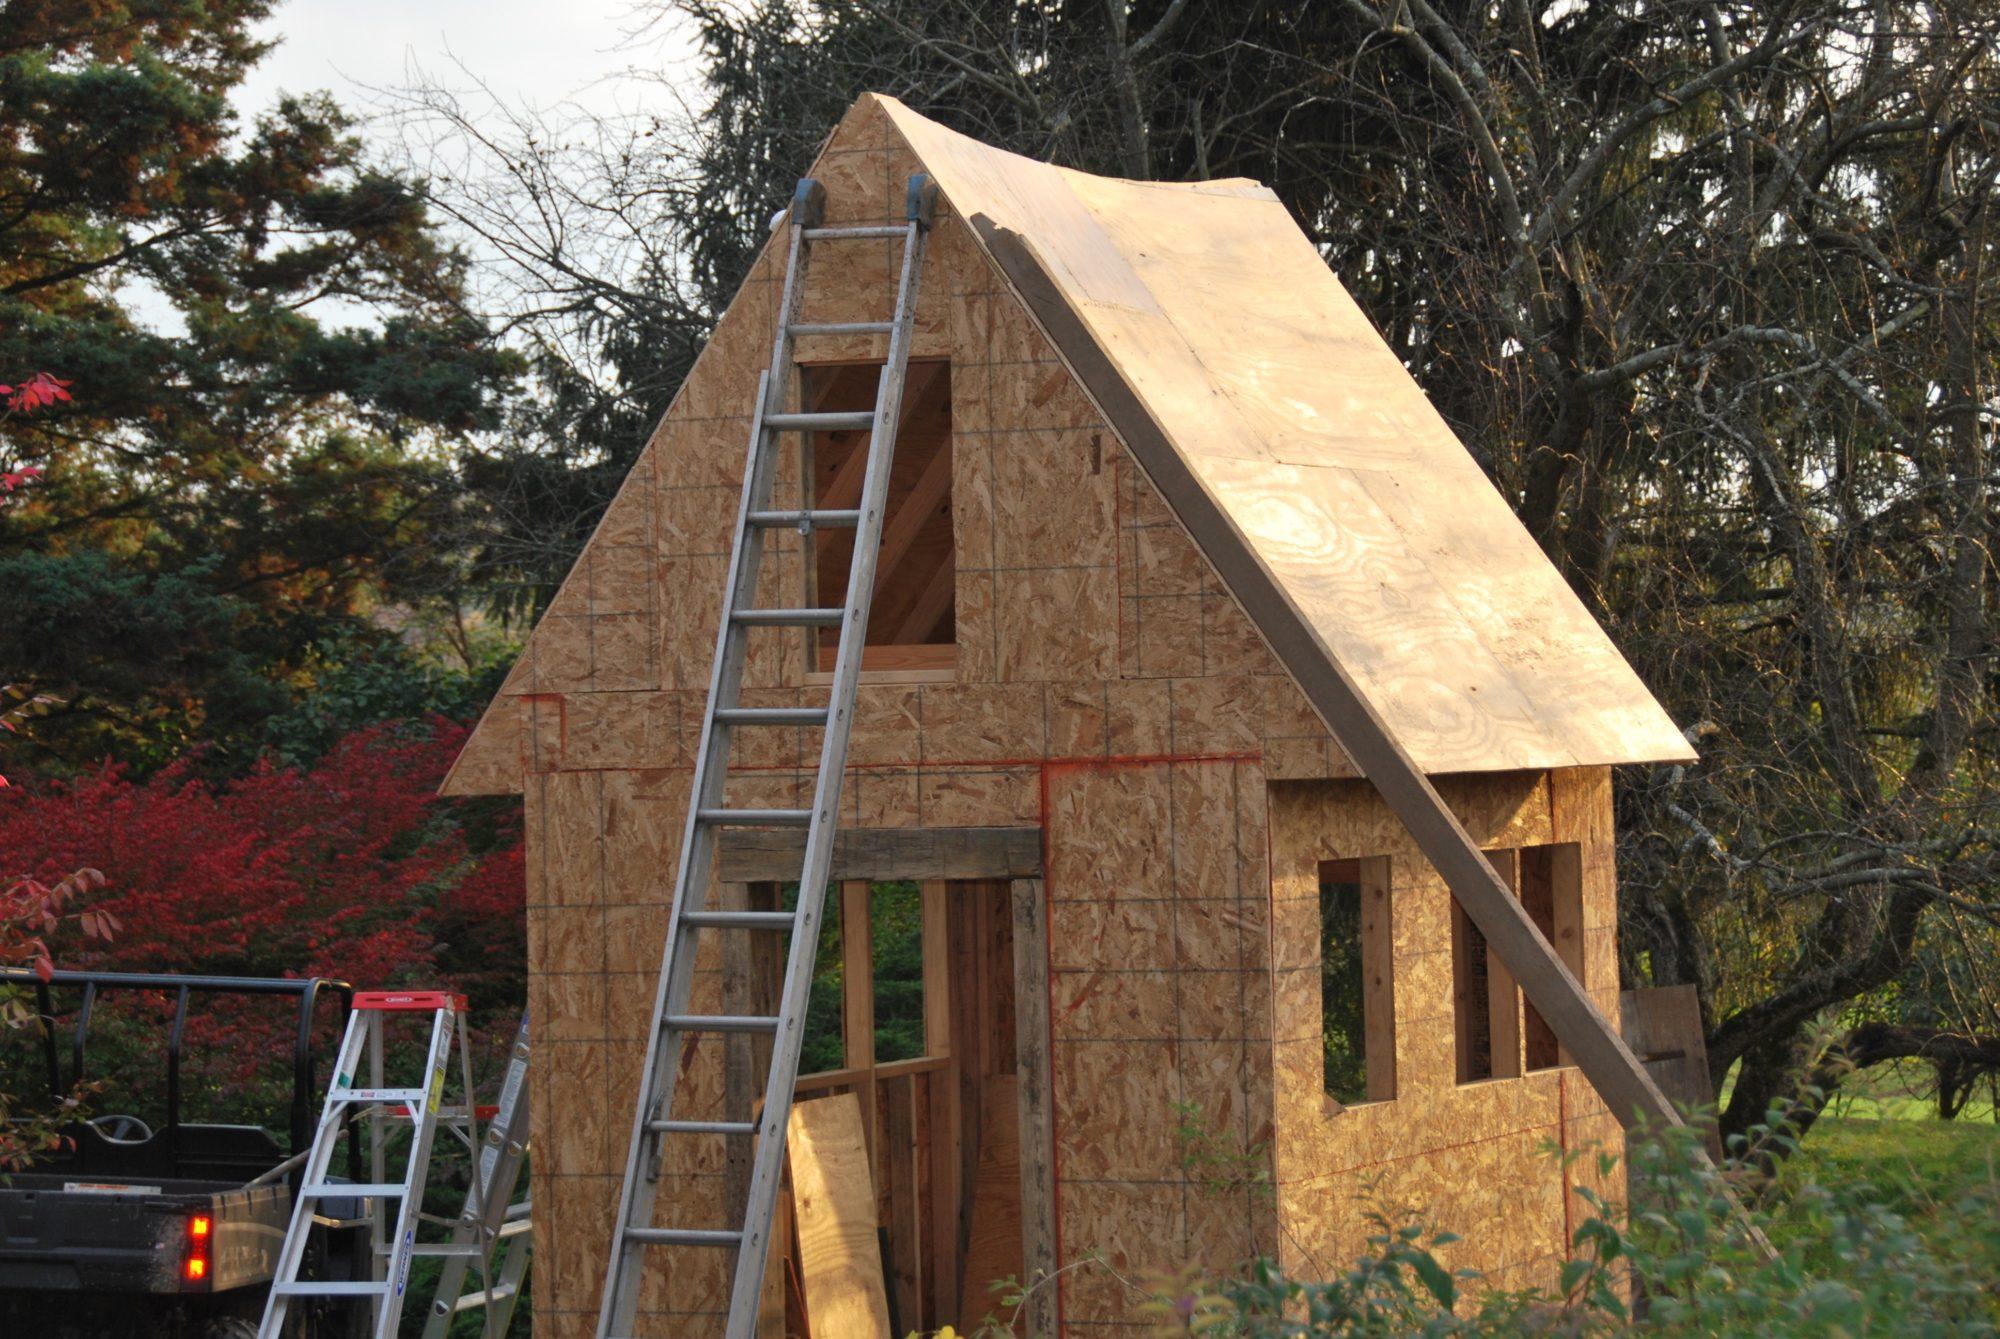 Bucks County Huhn Hut Backyard Chickens Community